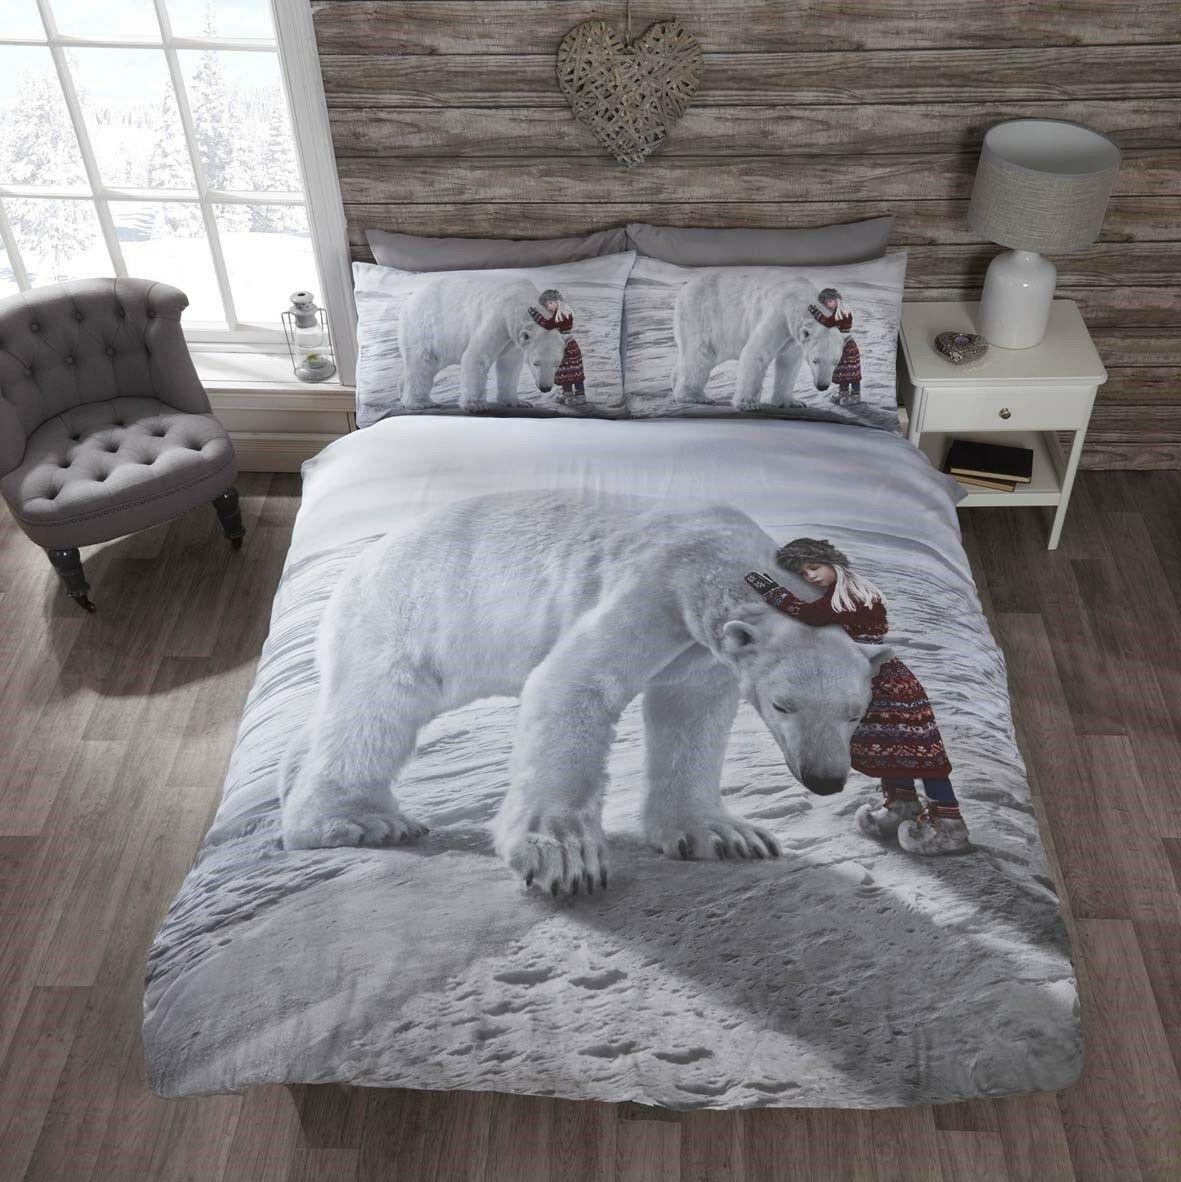 Rapport Anoushka Cute Polar Bear Snow Winter Duvet Cover Bedding Set Multi Bb Textiles Bb Textiles